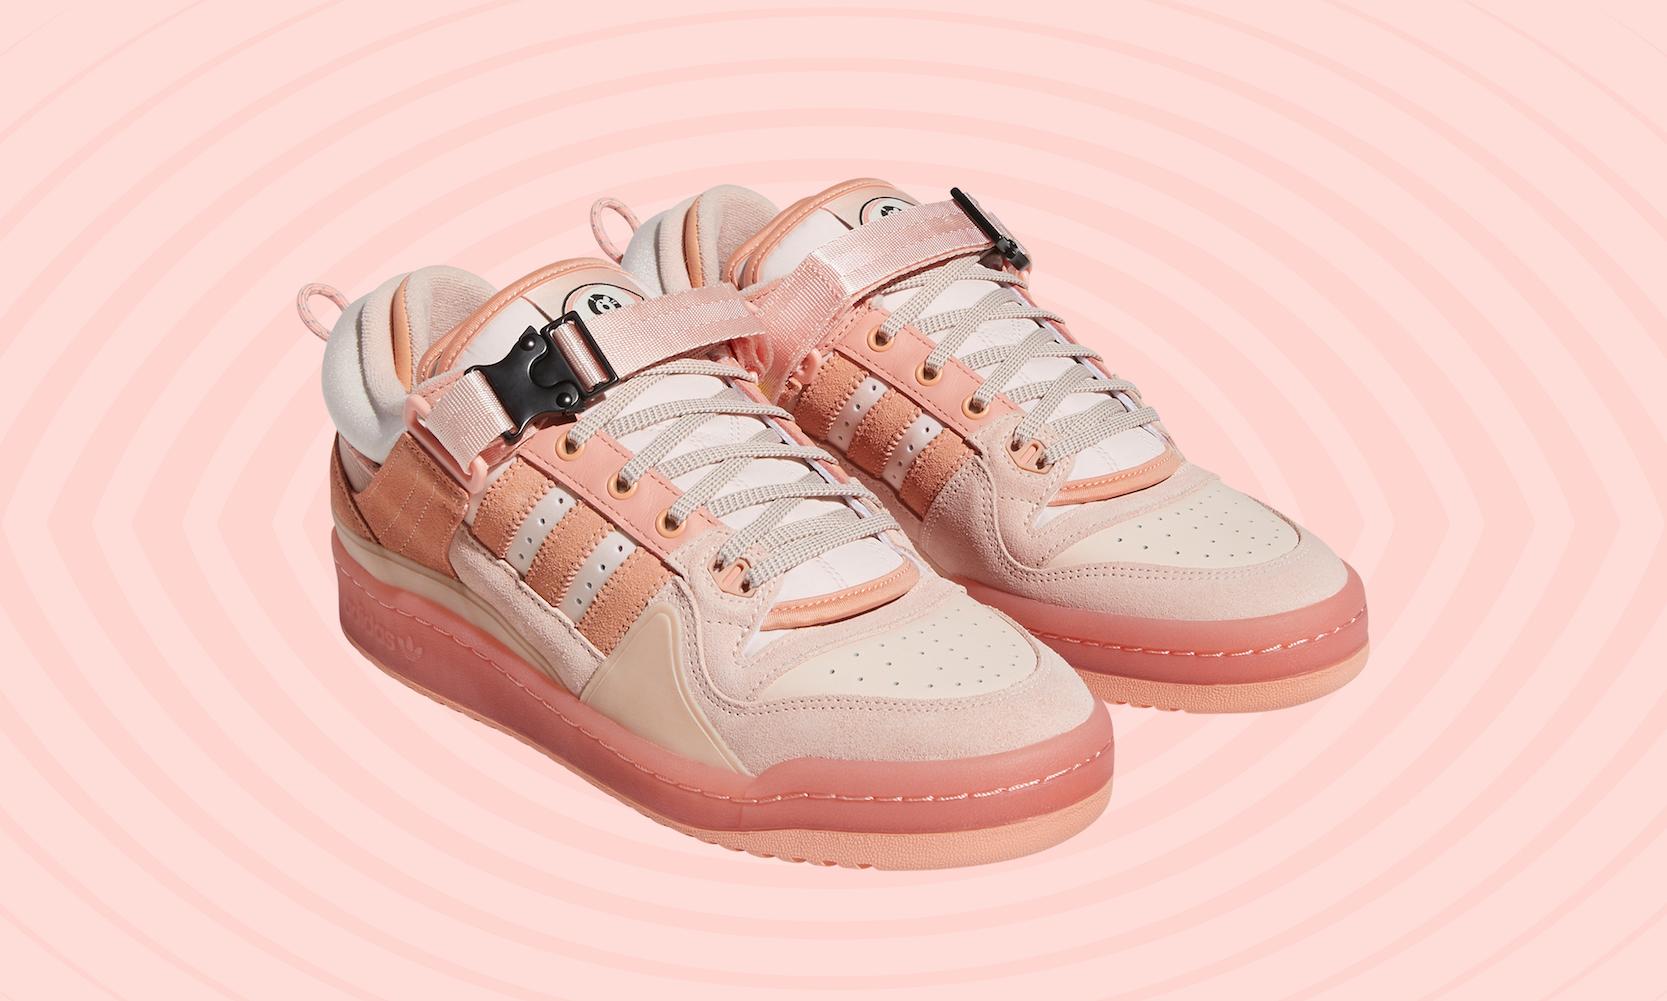 adidas OriginalsとファッションアイコンBAD BUNNYが春色シューズ